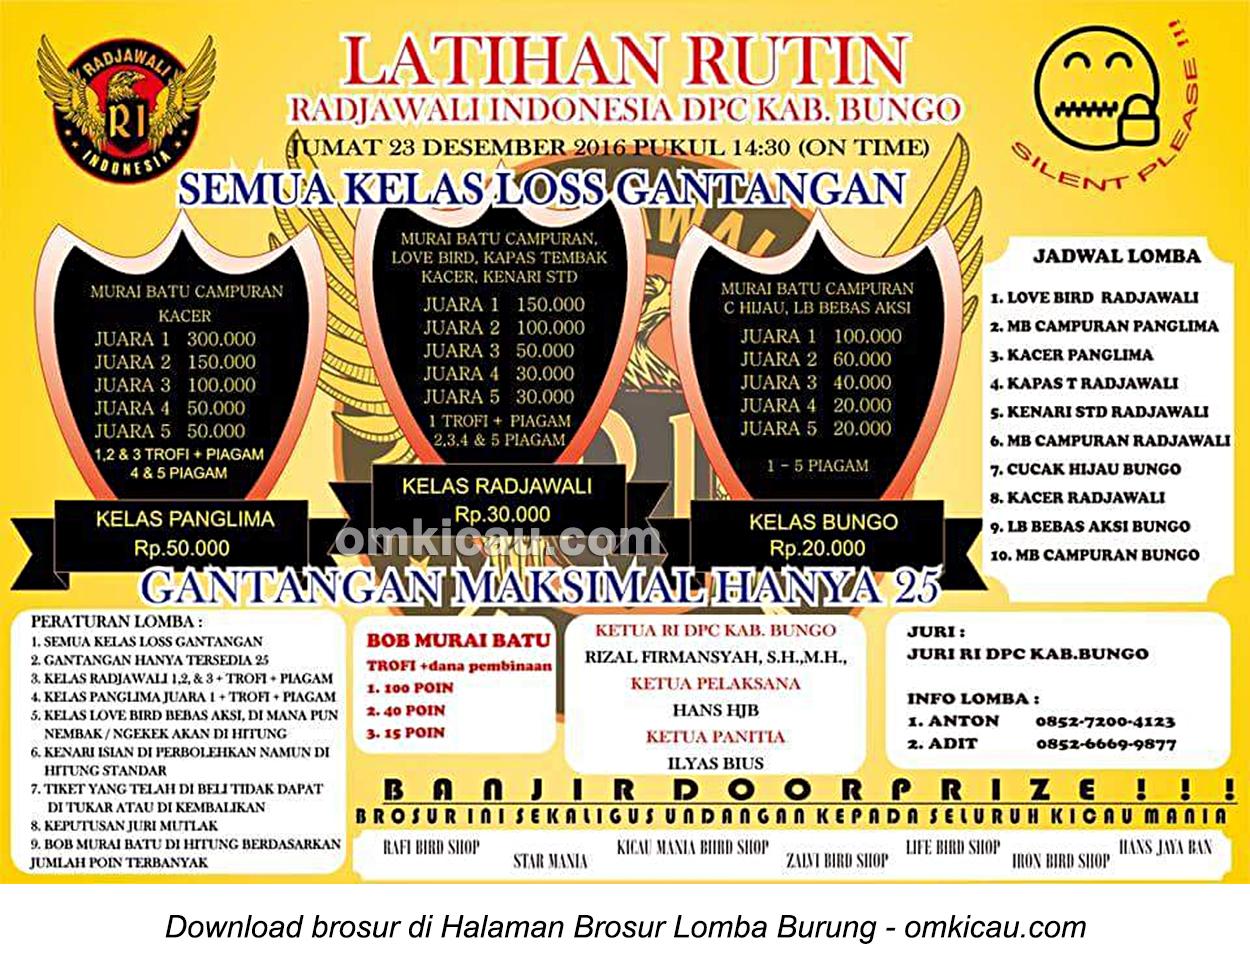 Brosur Latihan Rutin Radjawali Indonesia DPC Kabupaten Bungo, 23 Desember 2016